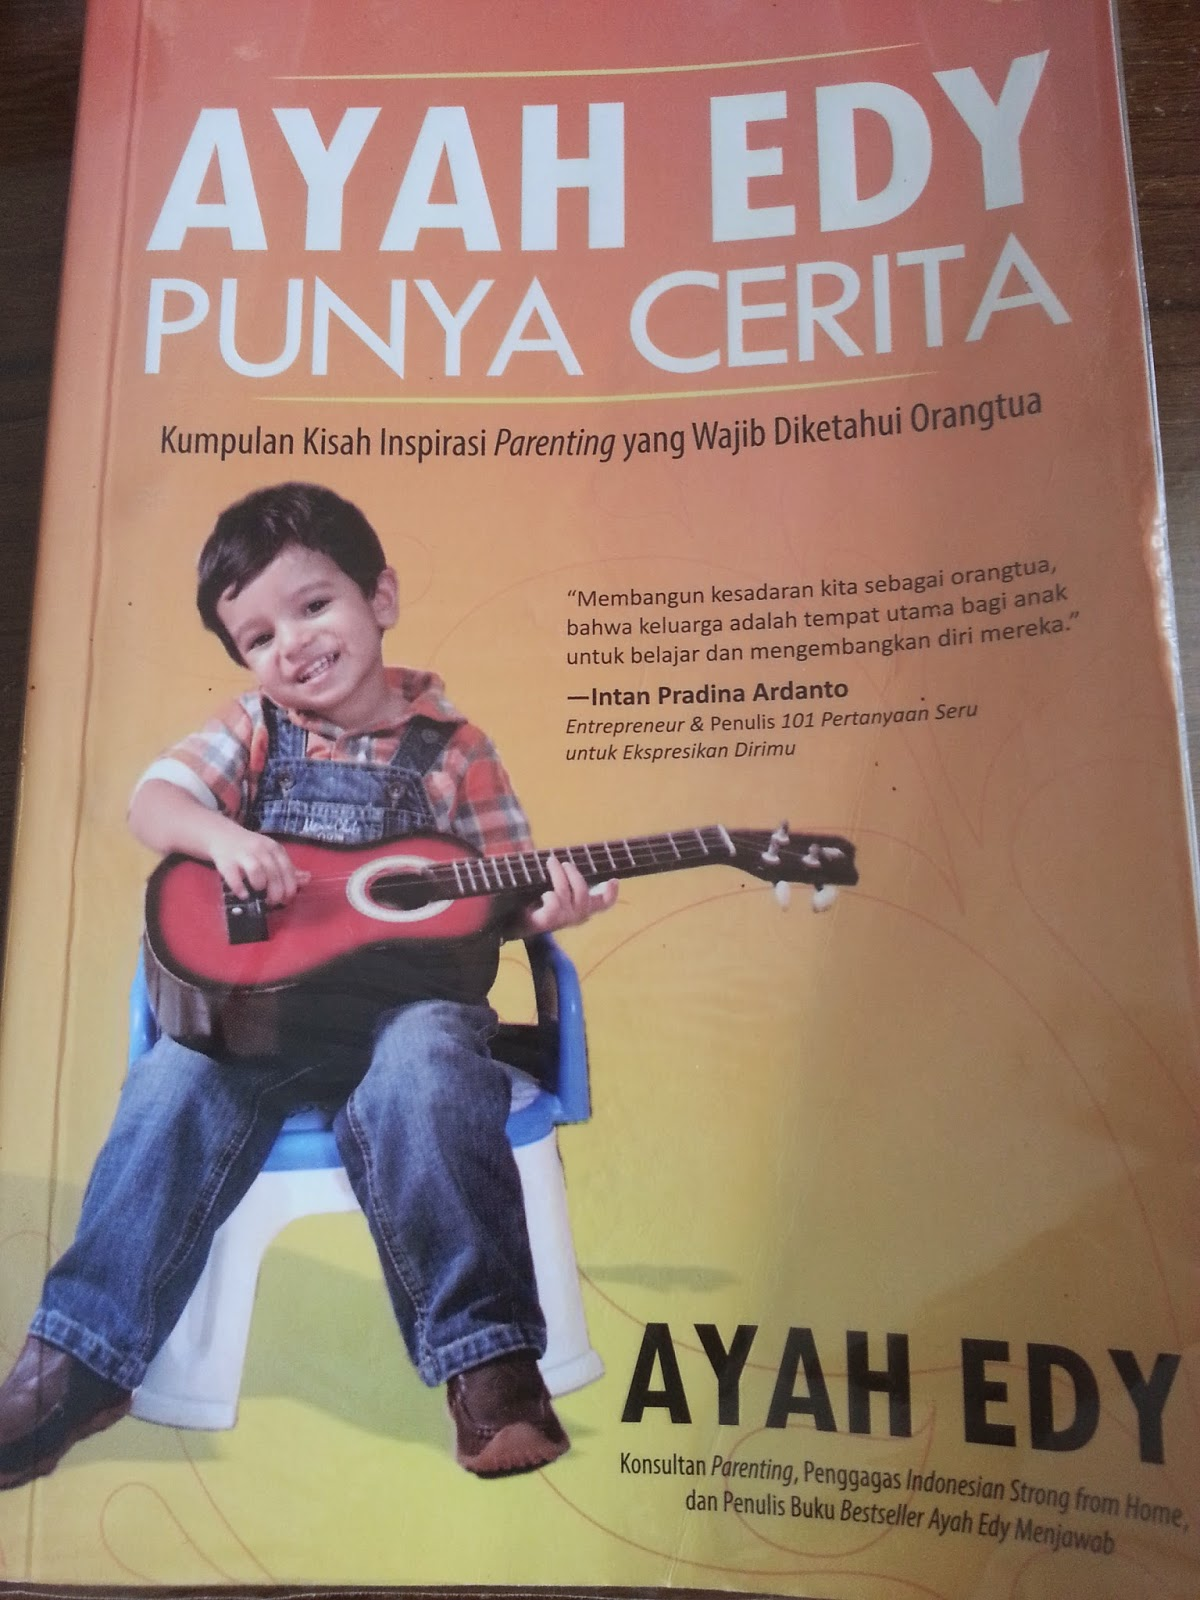 Resensi Buku Ayah Edy Punya Cerita